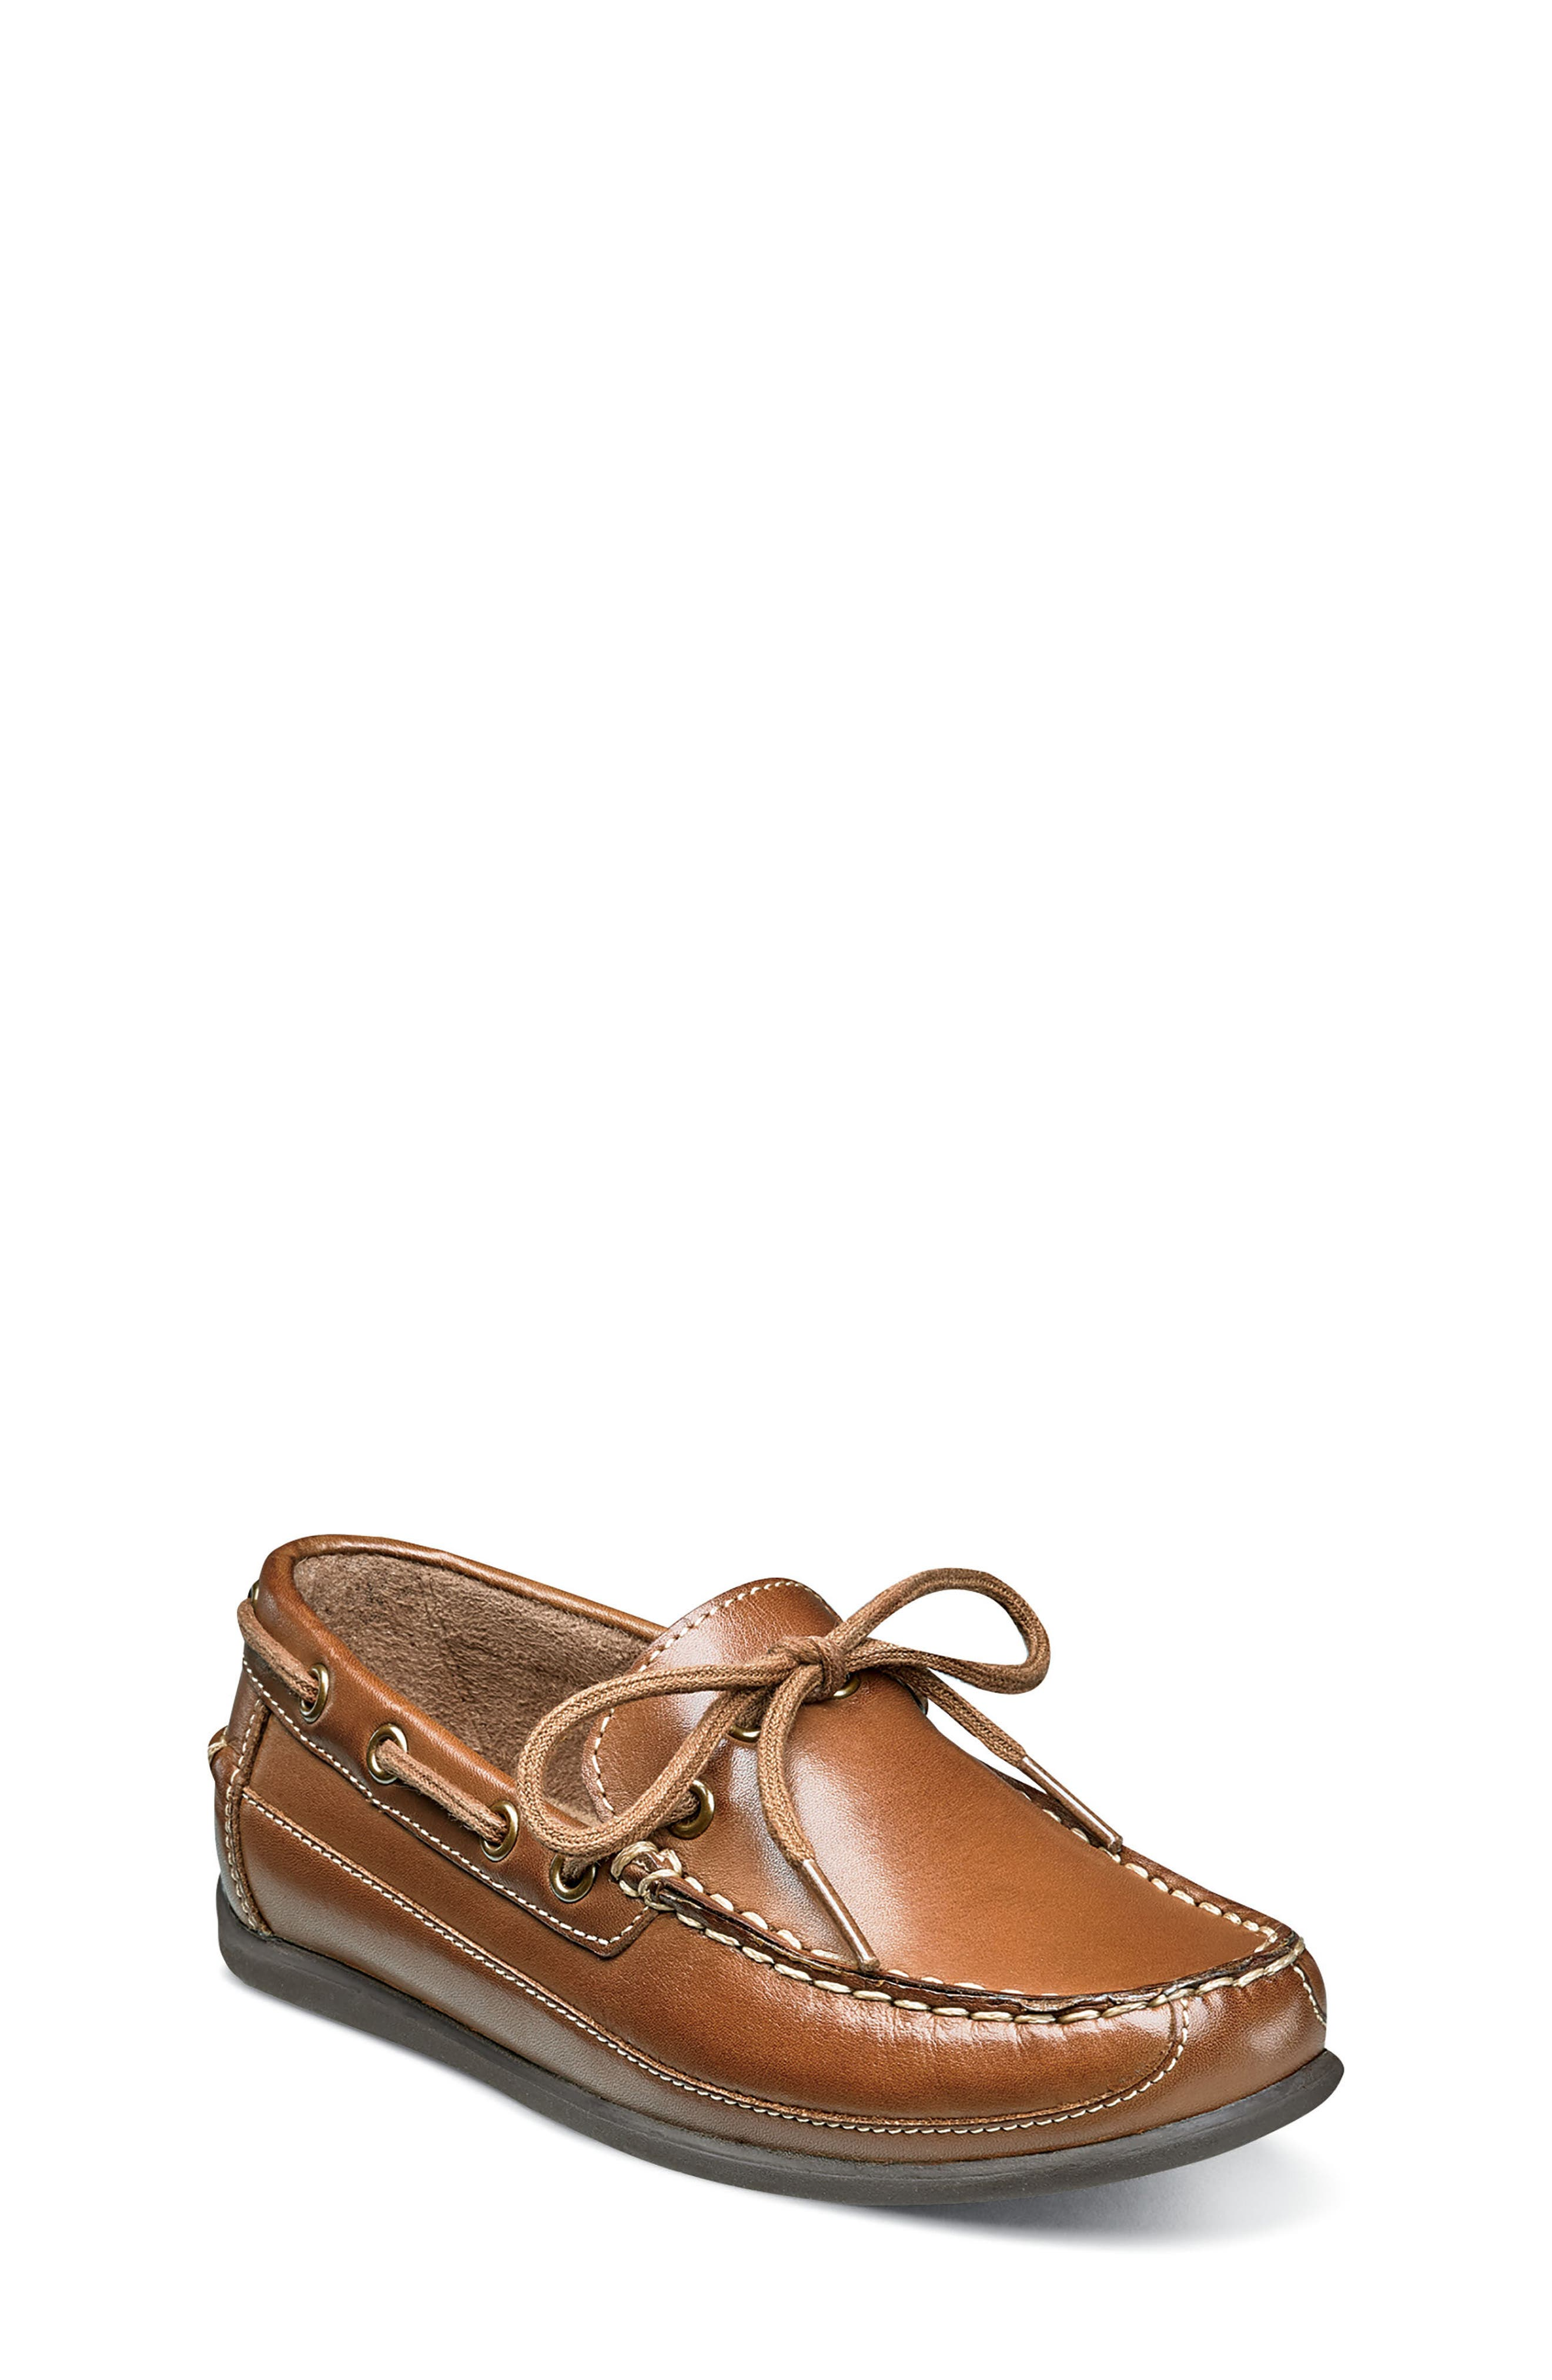 FLORSHEIM Jasper Boat Shoe, Main, color, SADDLE TAN